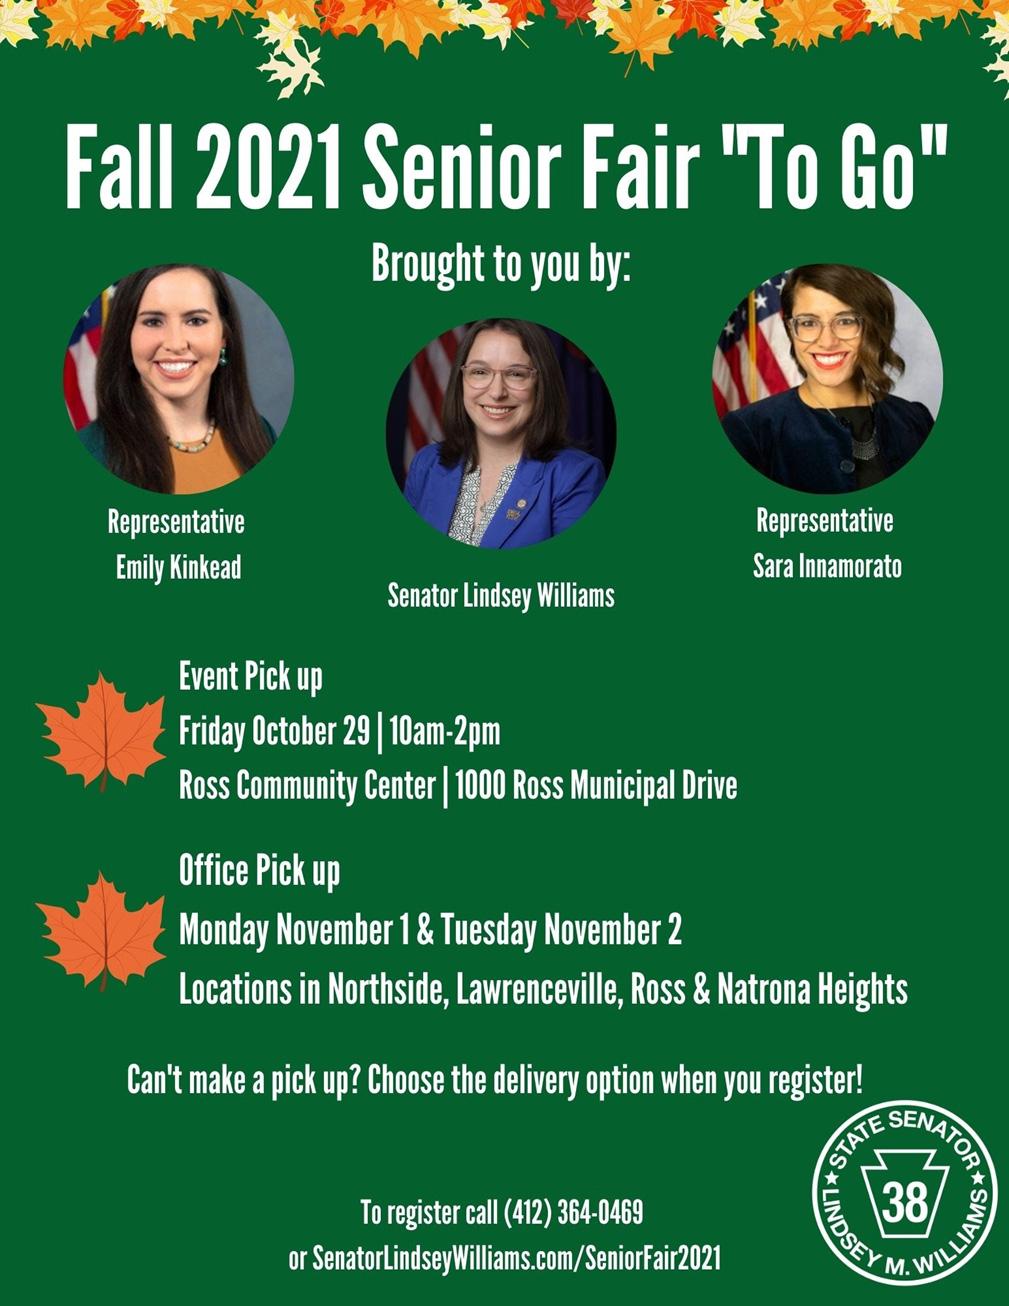 Fall Senior Fair to Go!